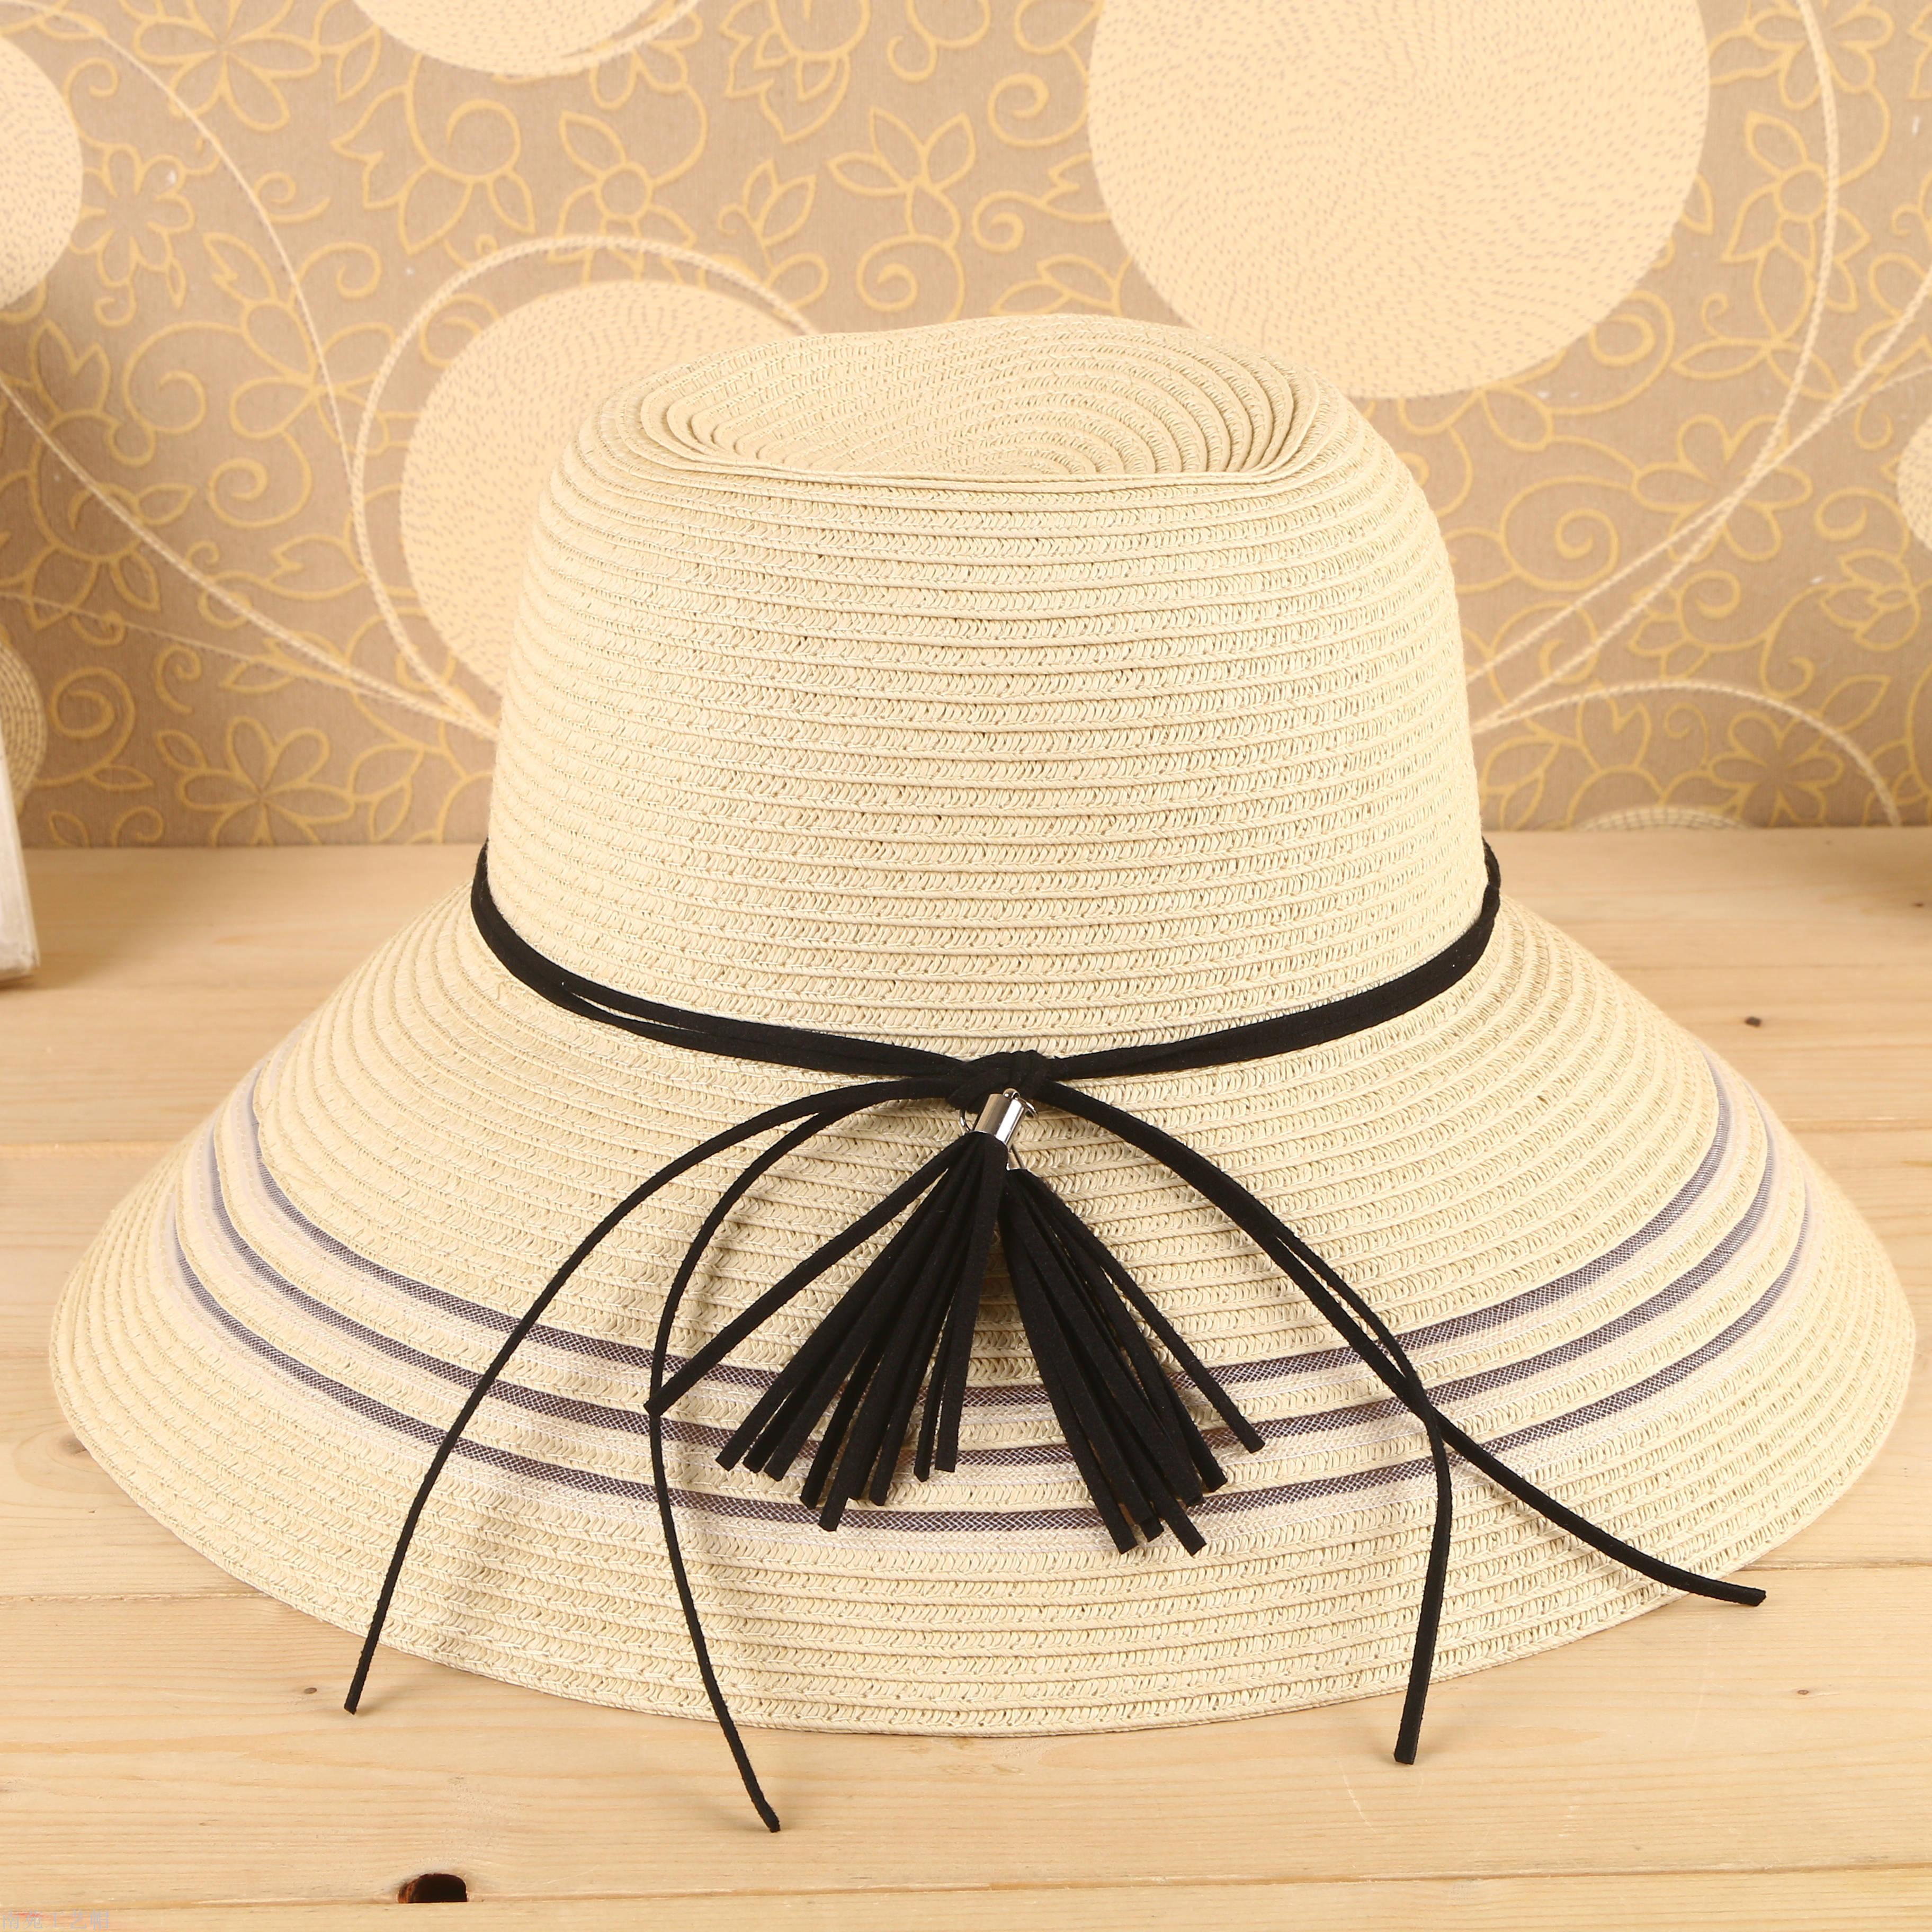 c36fbf728318a7 Supply Hat lady's summer hat girl summer beach hat han version beach hat  beach sun hat.-